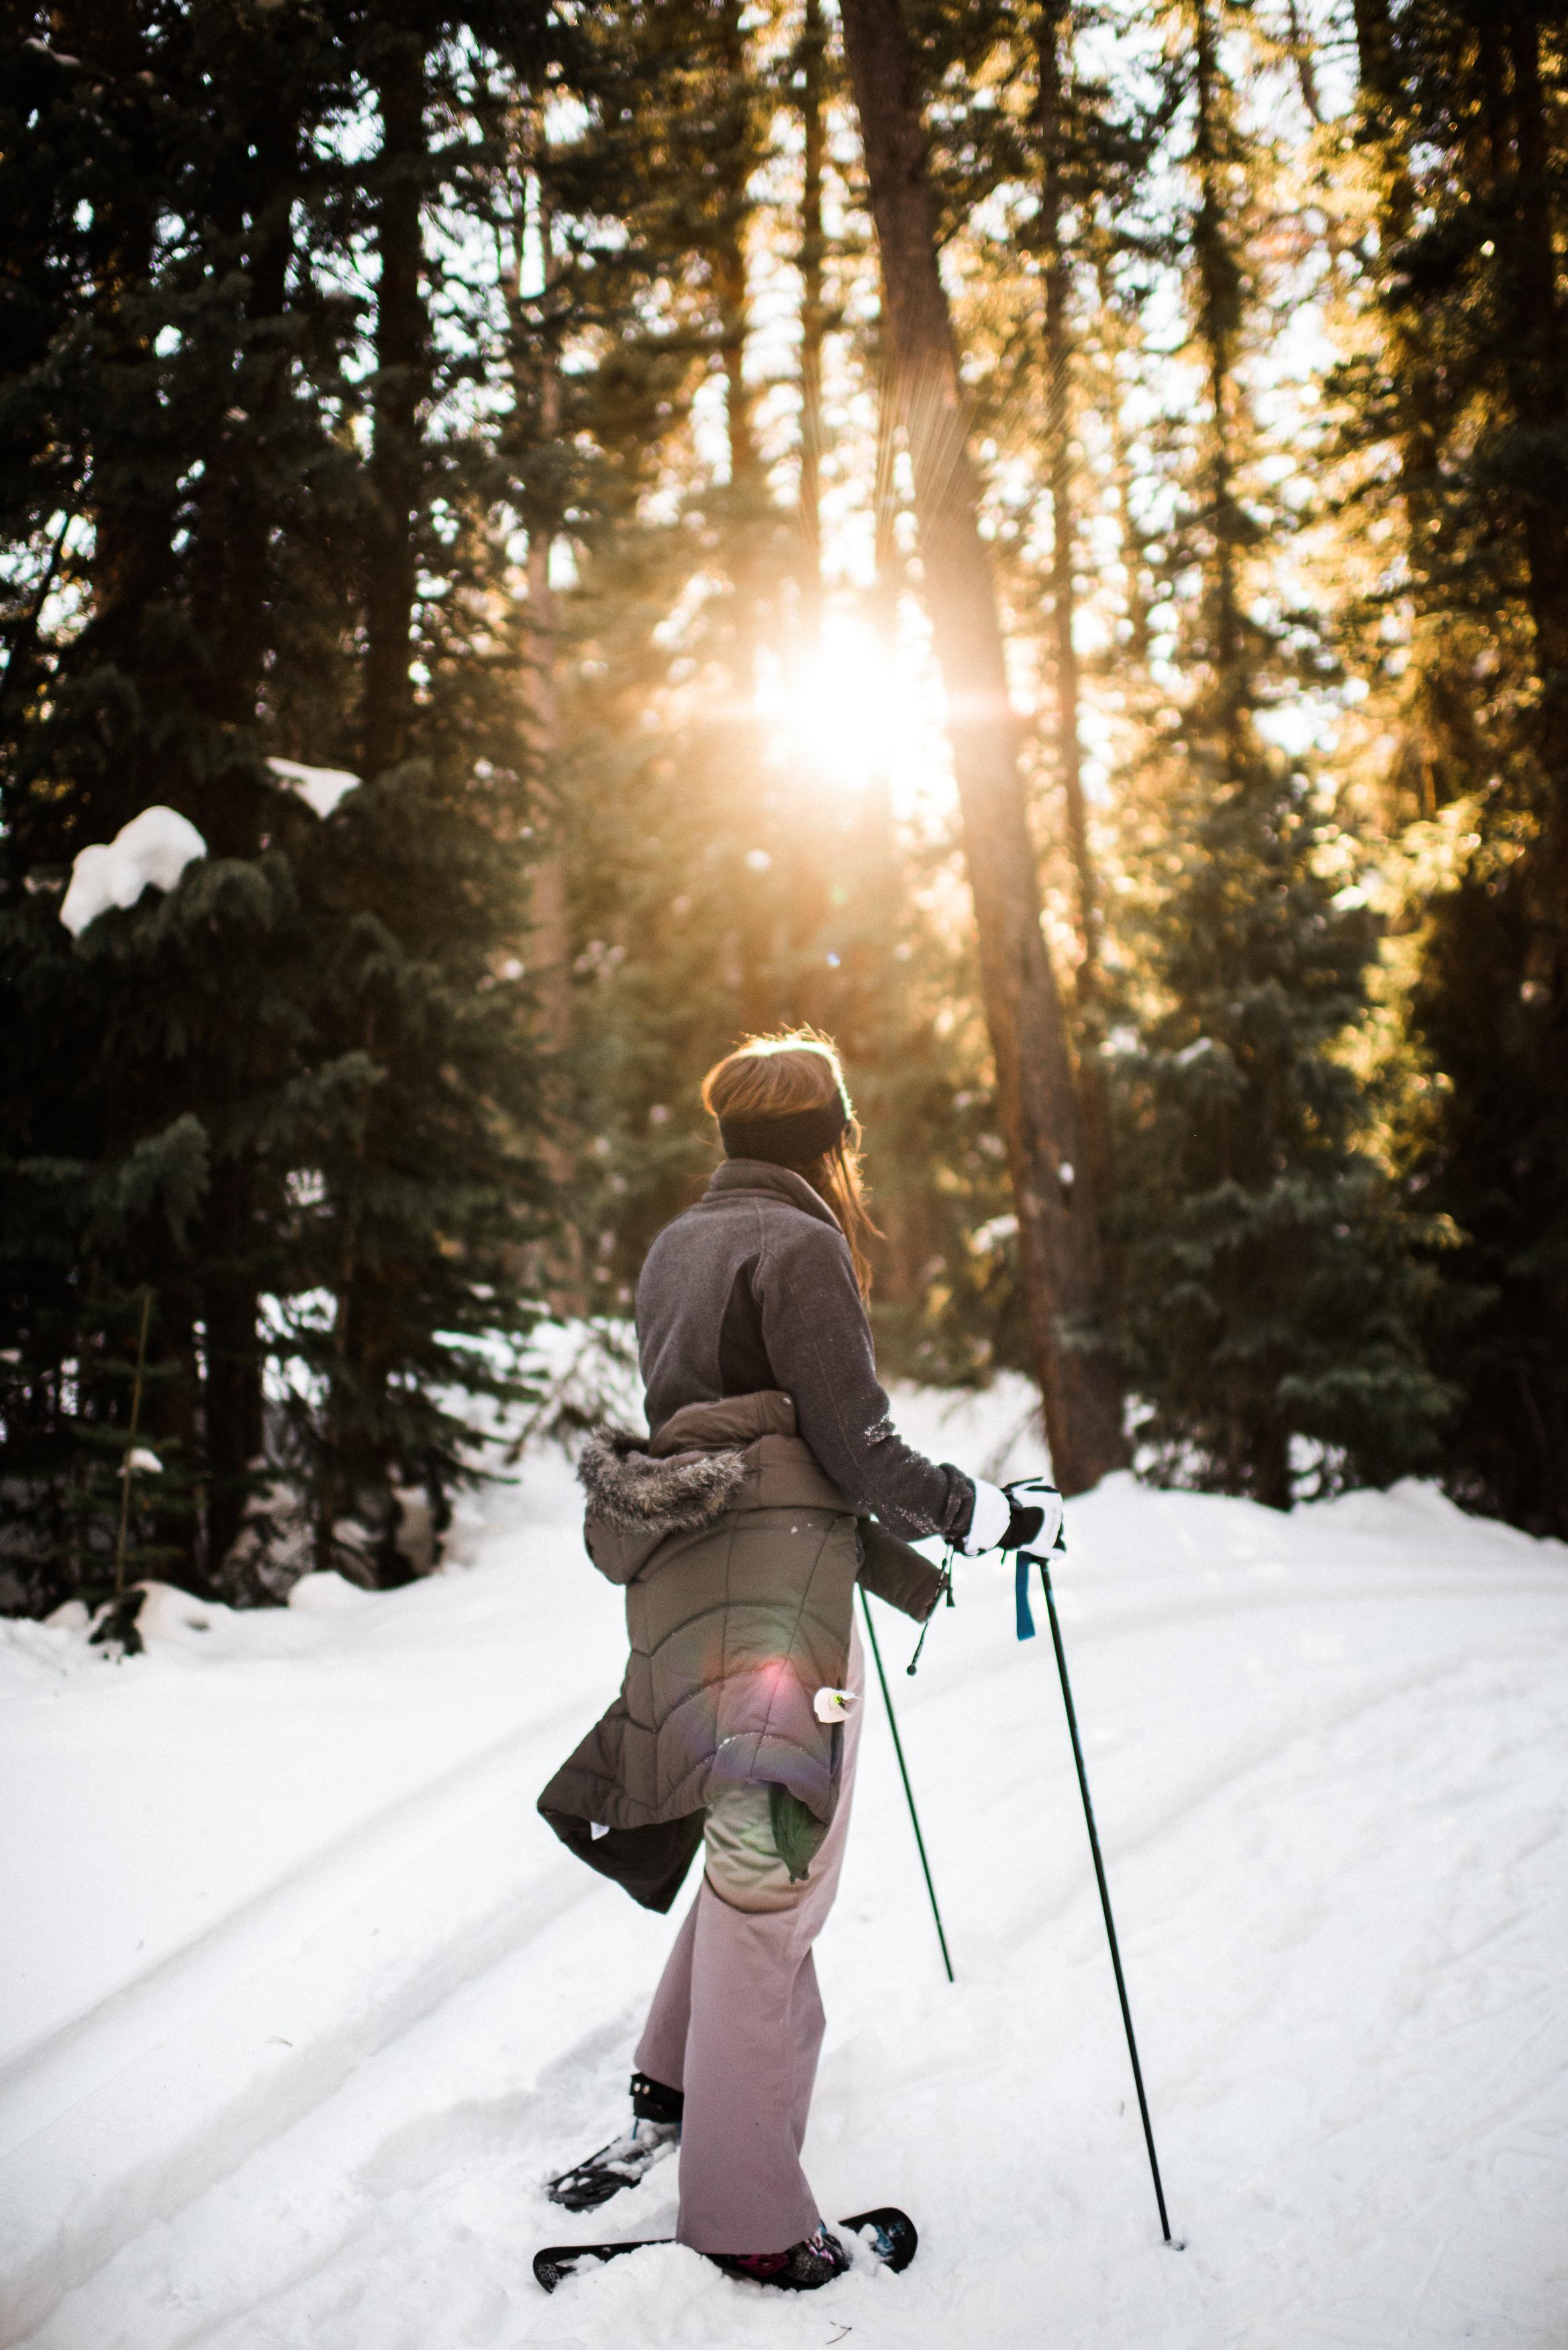 TaraShupe_Outdoor_Photographer_Loweprobags_Colorado_Copper_Mountains_Ski_82.jpg